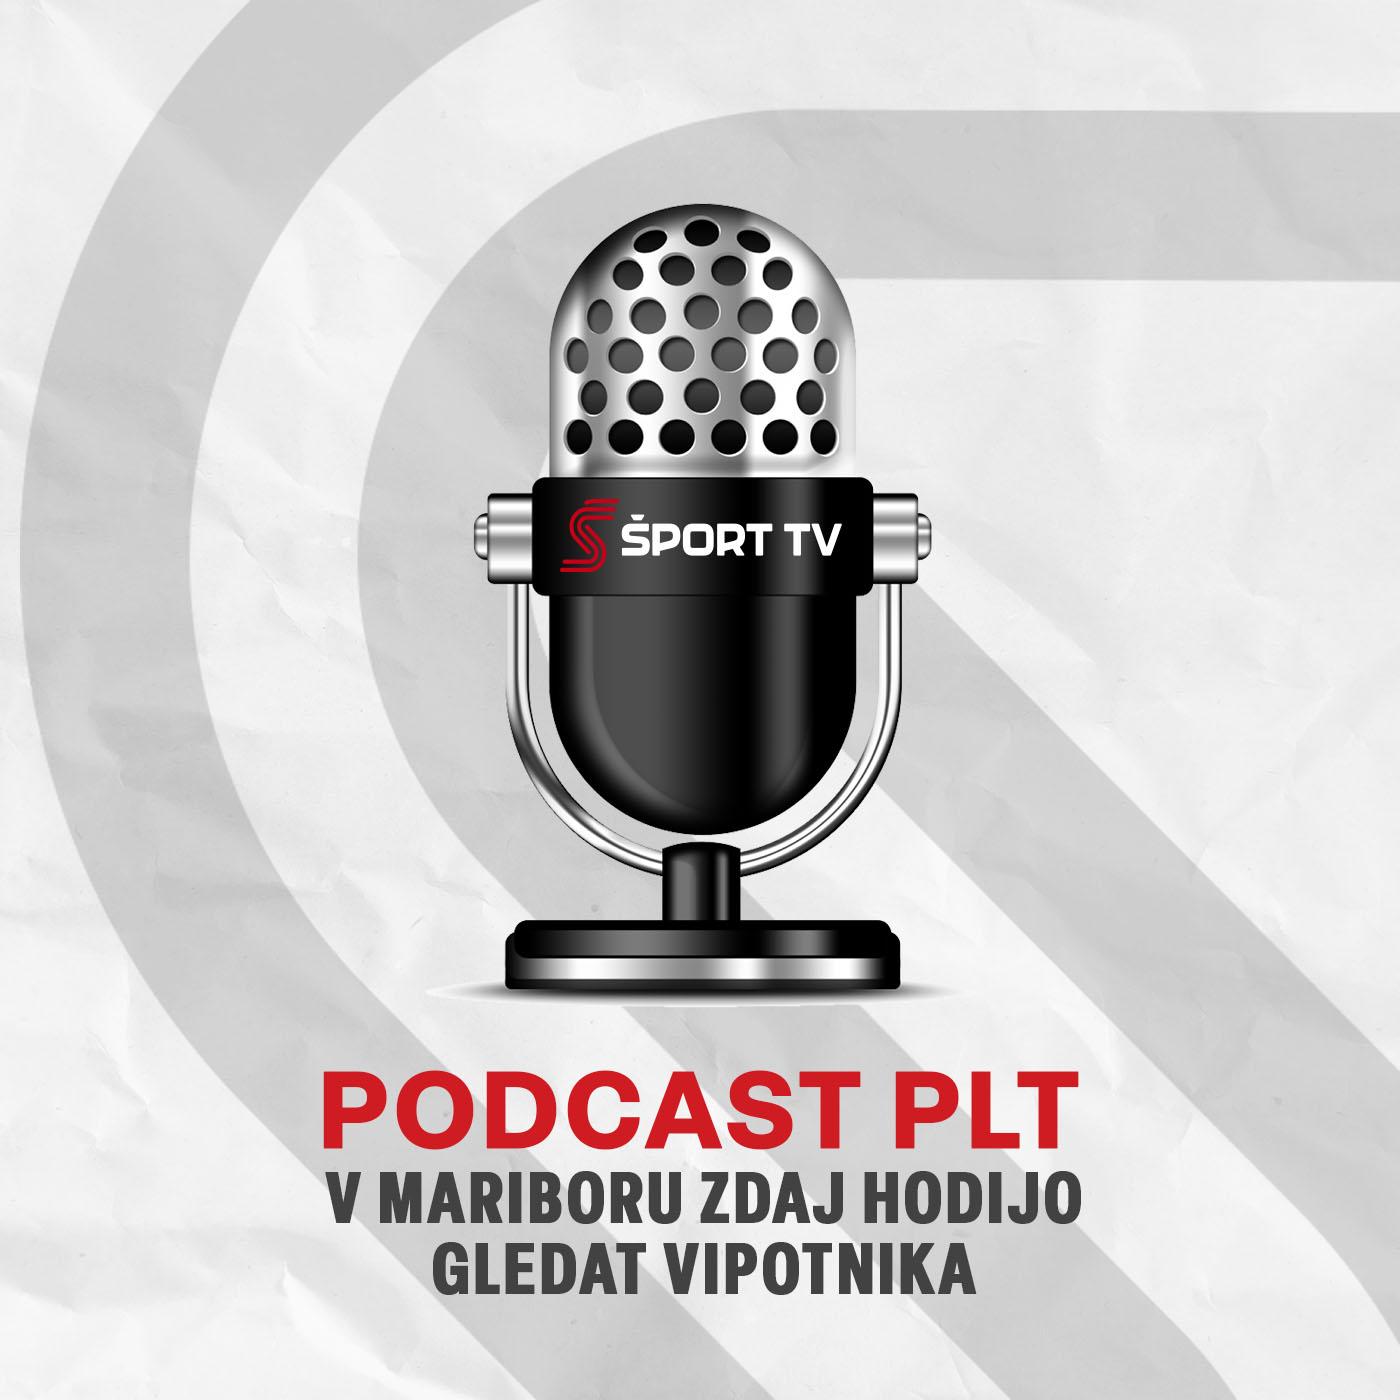 Šport TV podcast